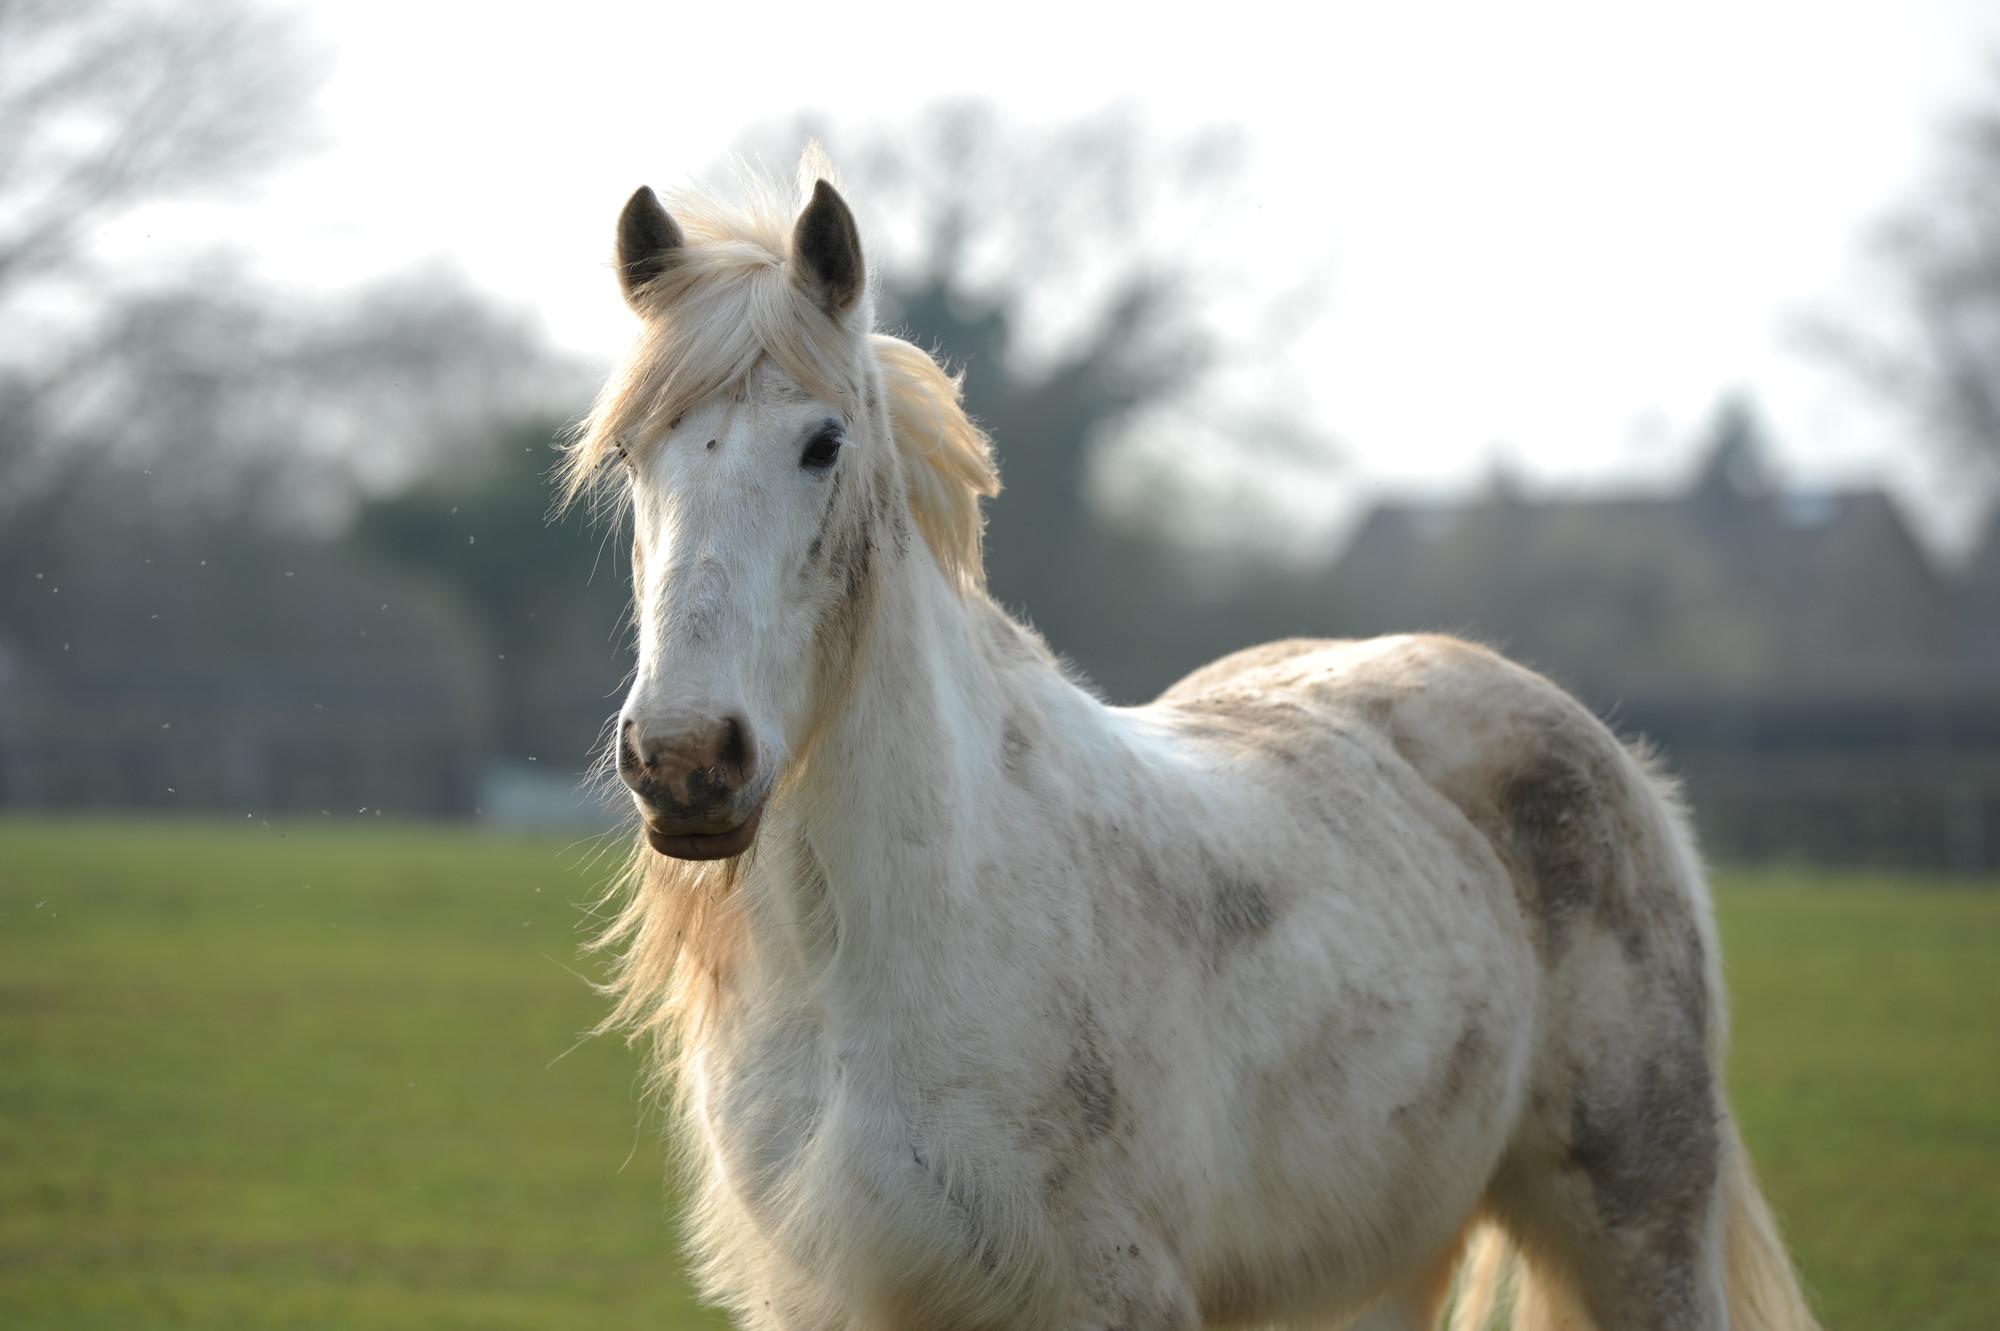 The field-kept horse   Horse grazing   Blue Cross